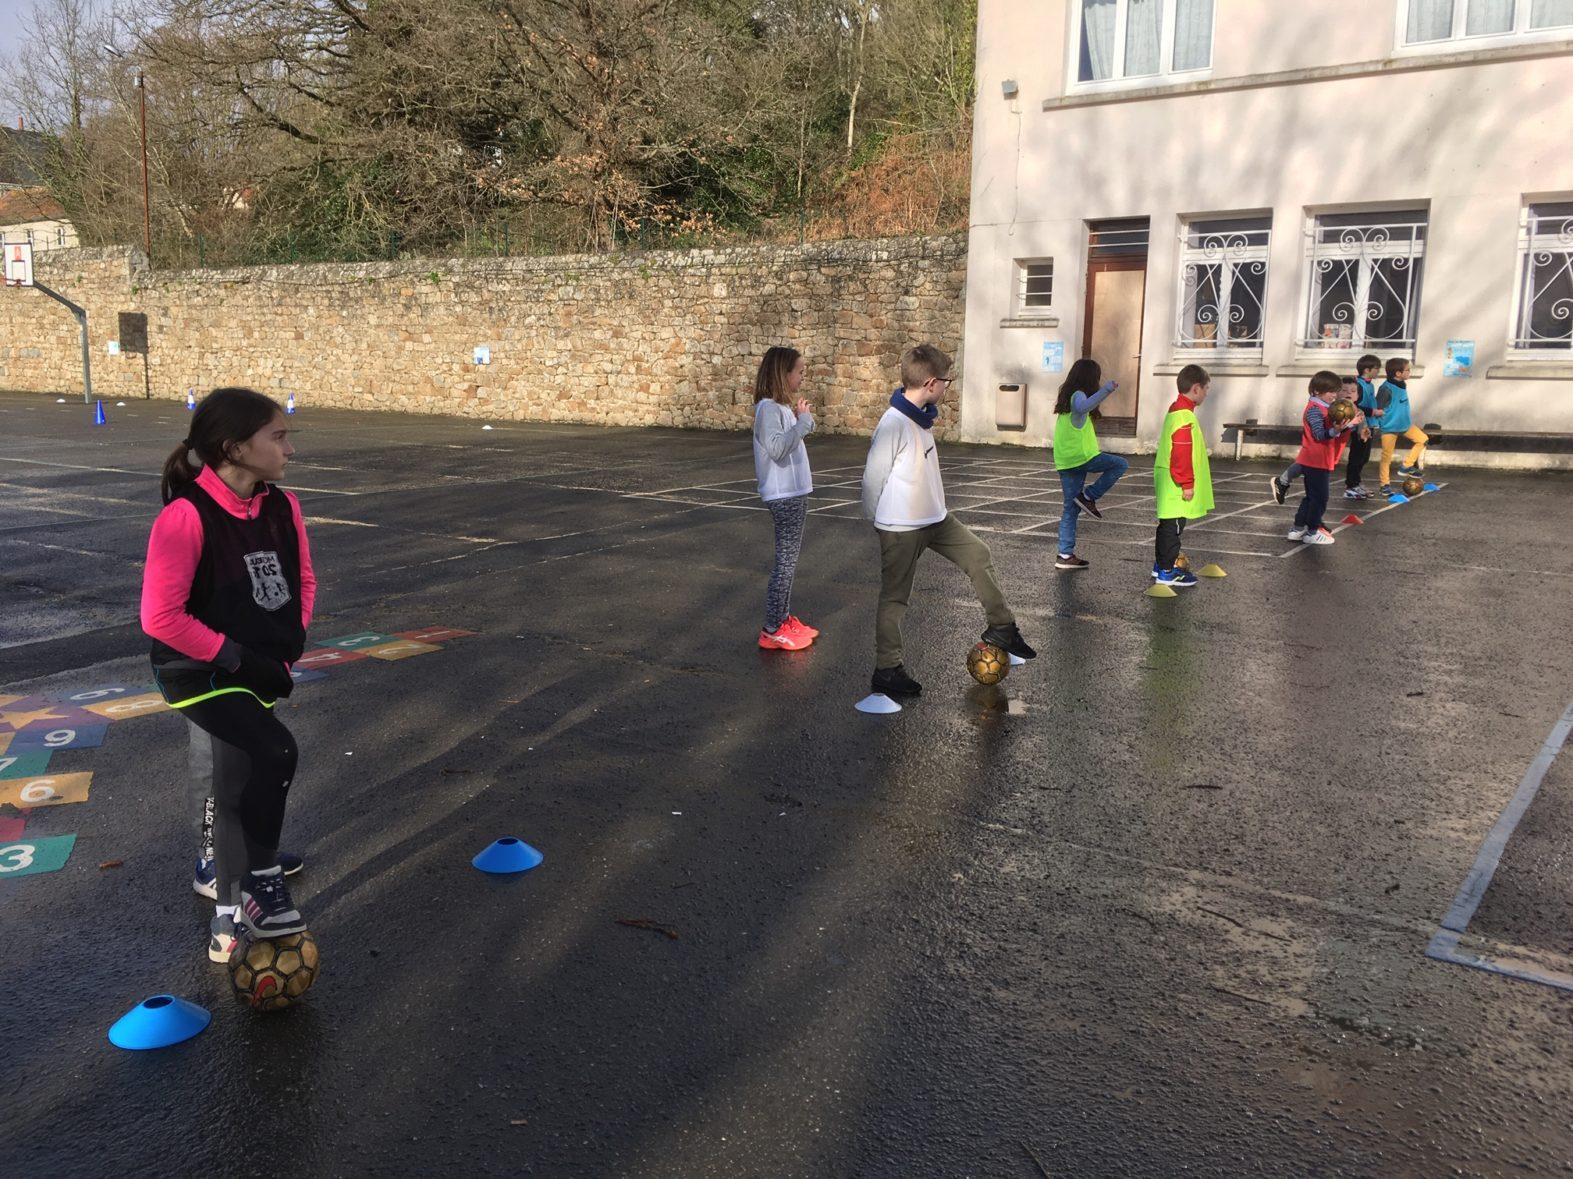 Mell-droad er skol – Foot à l'école